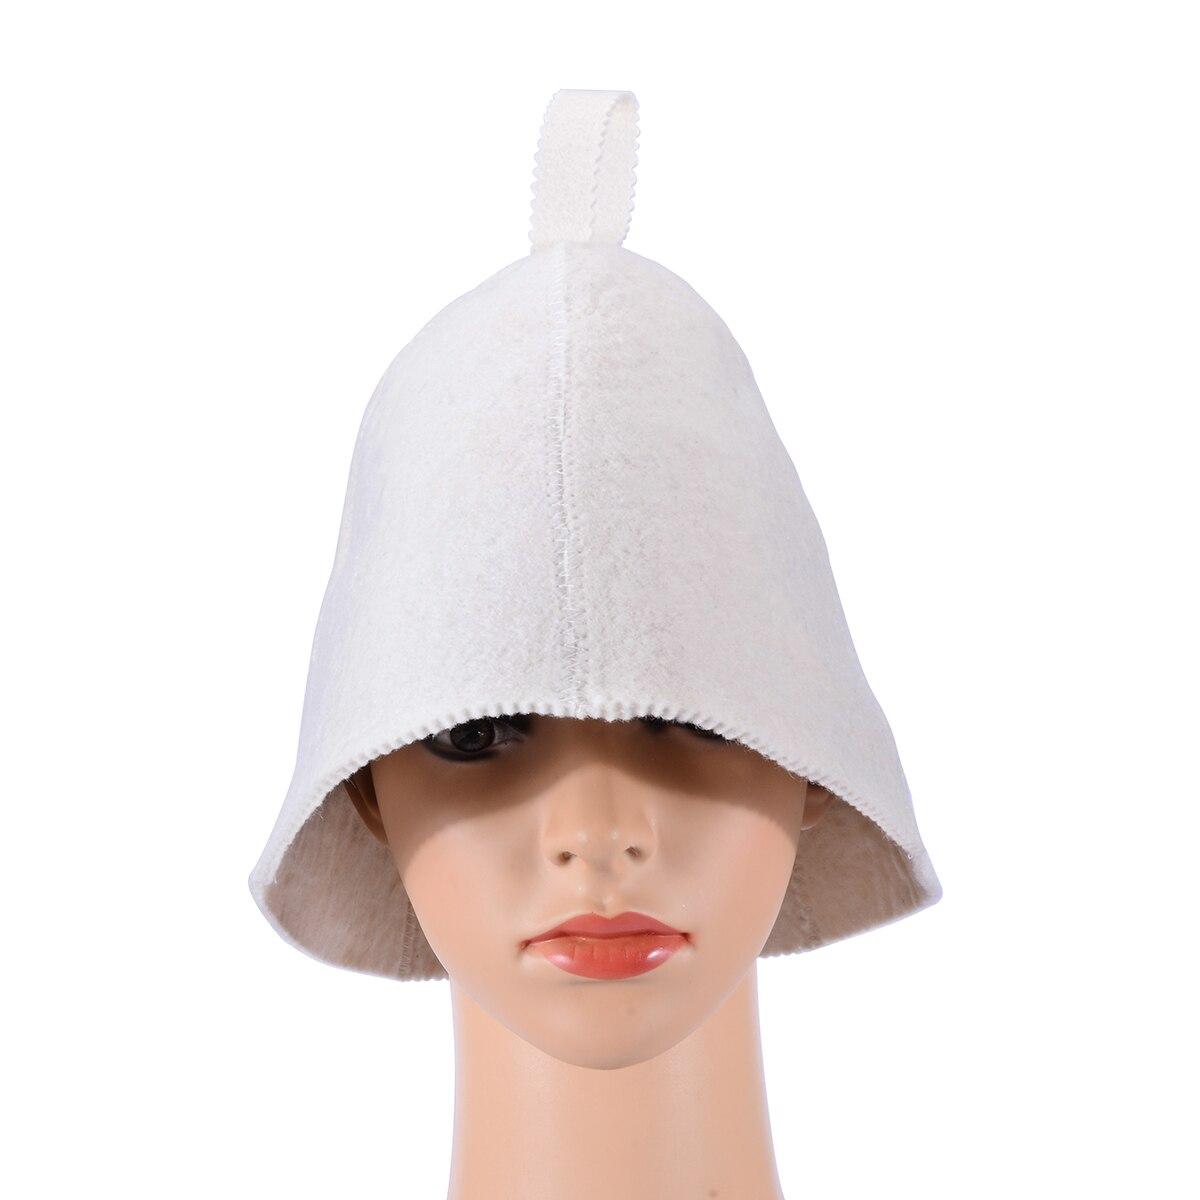 Classic Soft Wool Felt Sauna Steam Hat Bath Supply Cap Diameter 22cm Cute Shower Caps for Beauty Decor